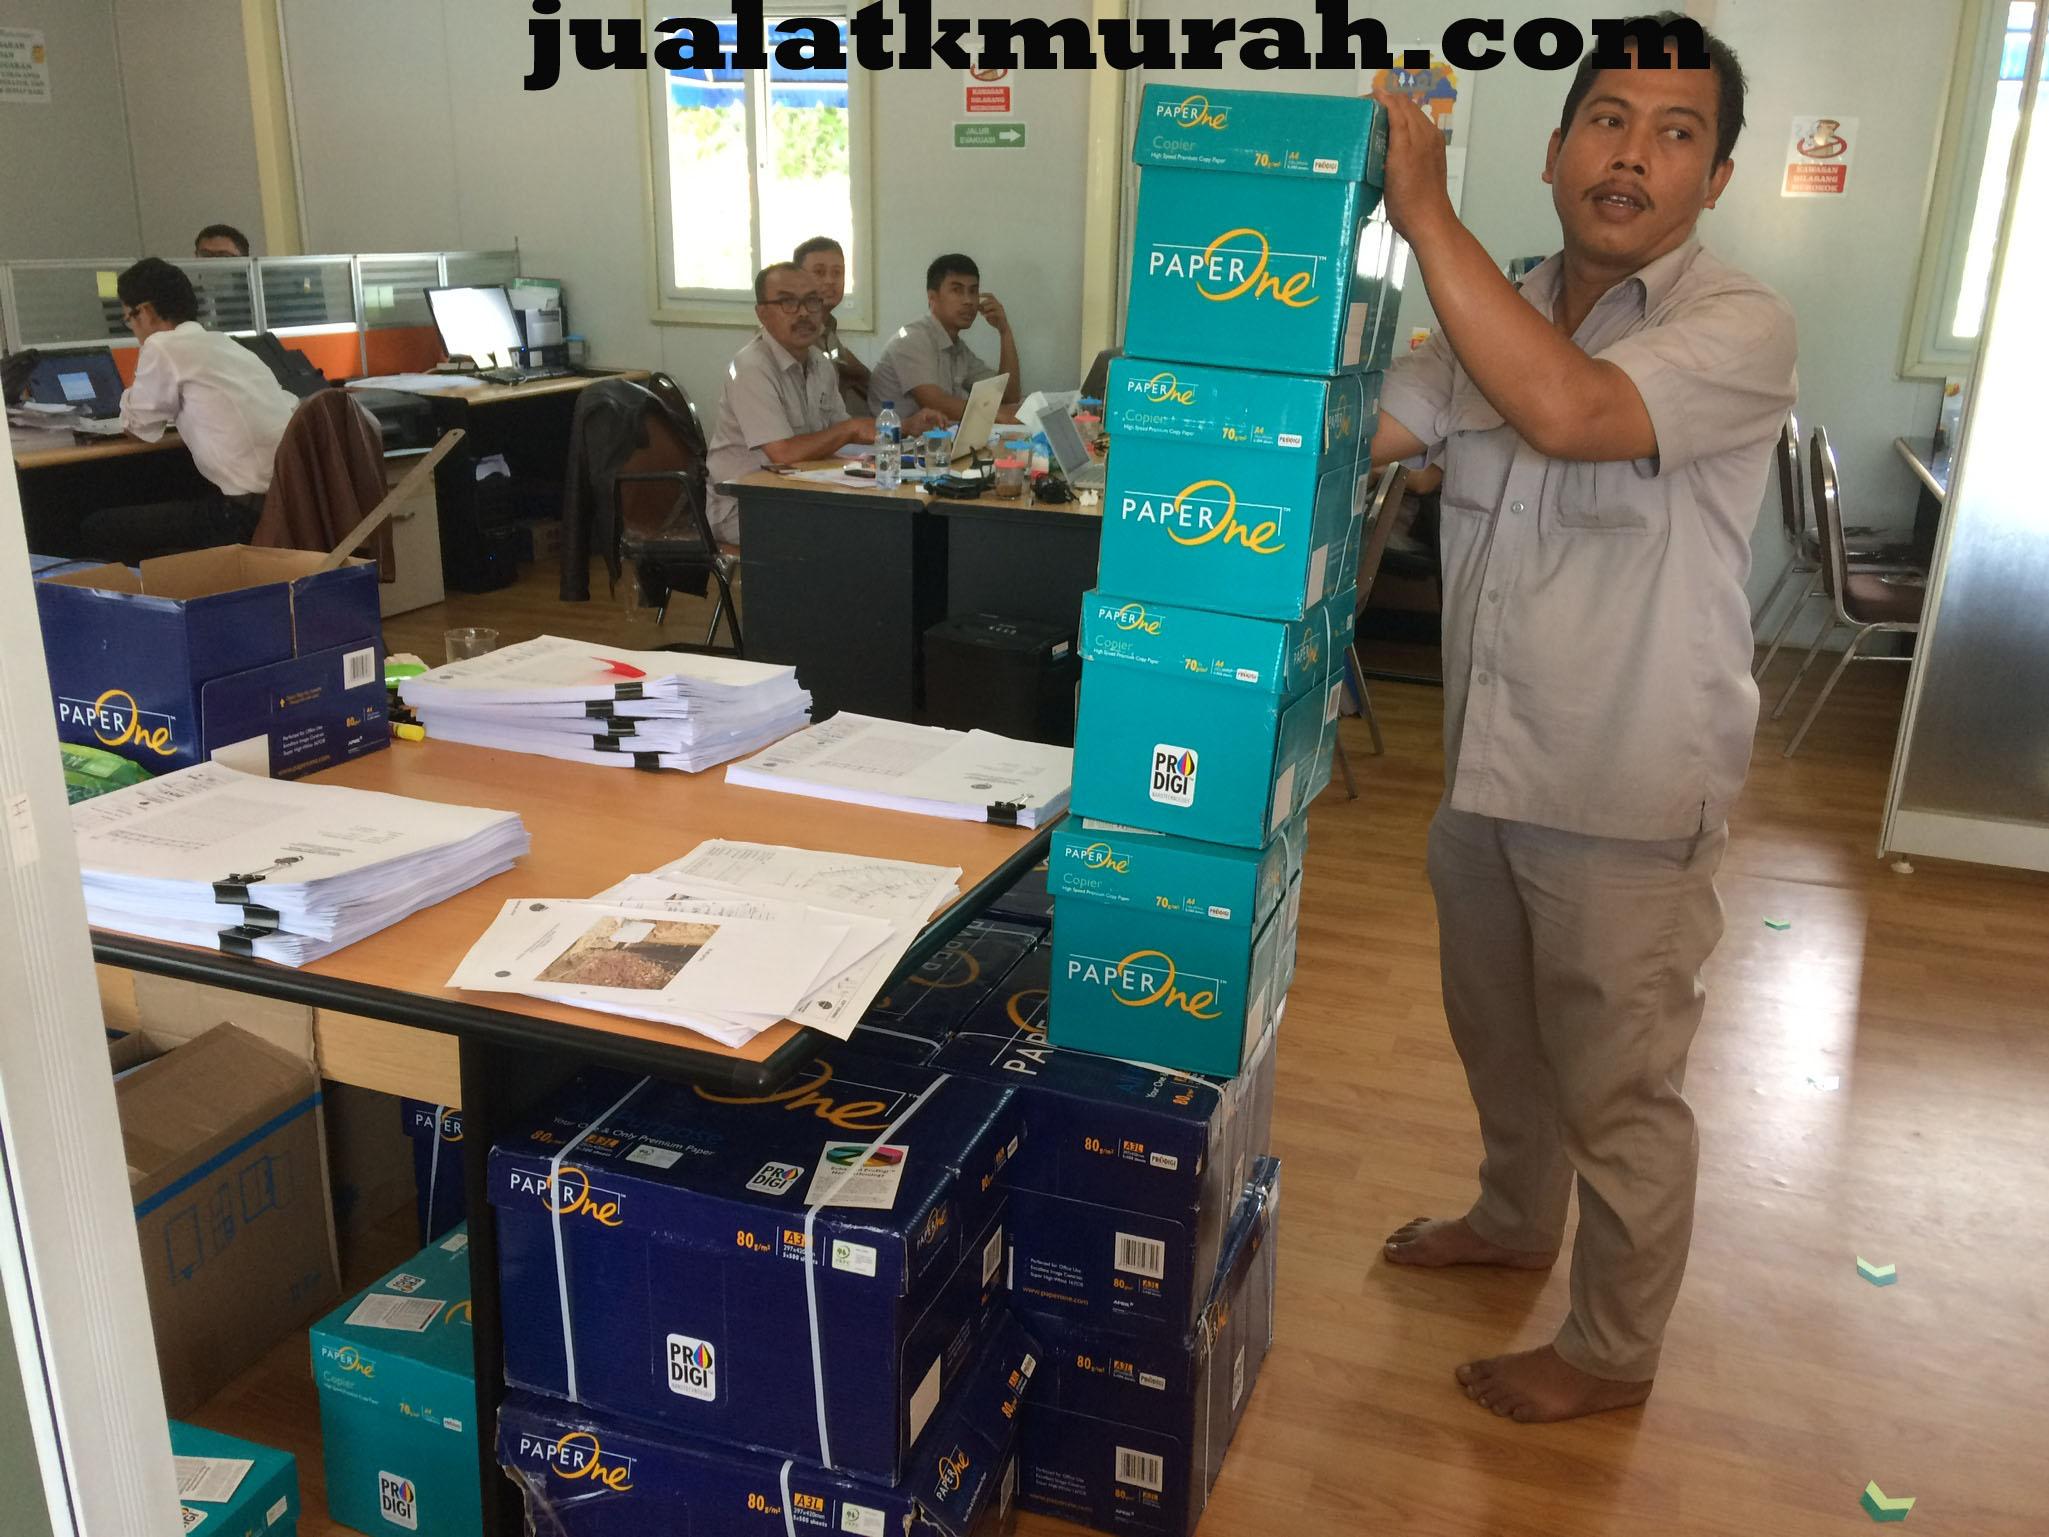 Jual ATK Murah di Condet Jakarta Timur